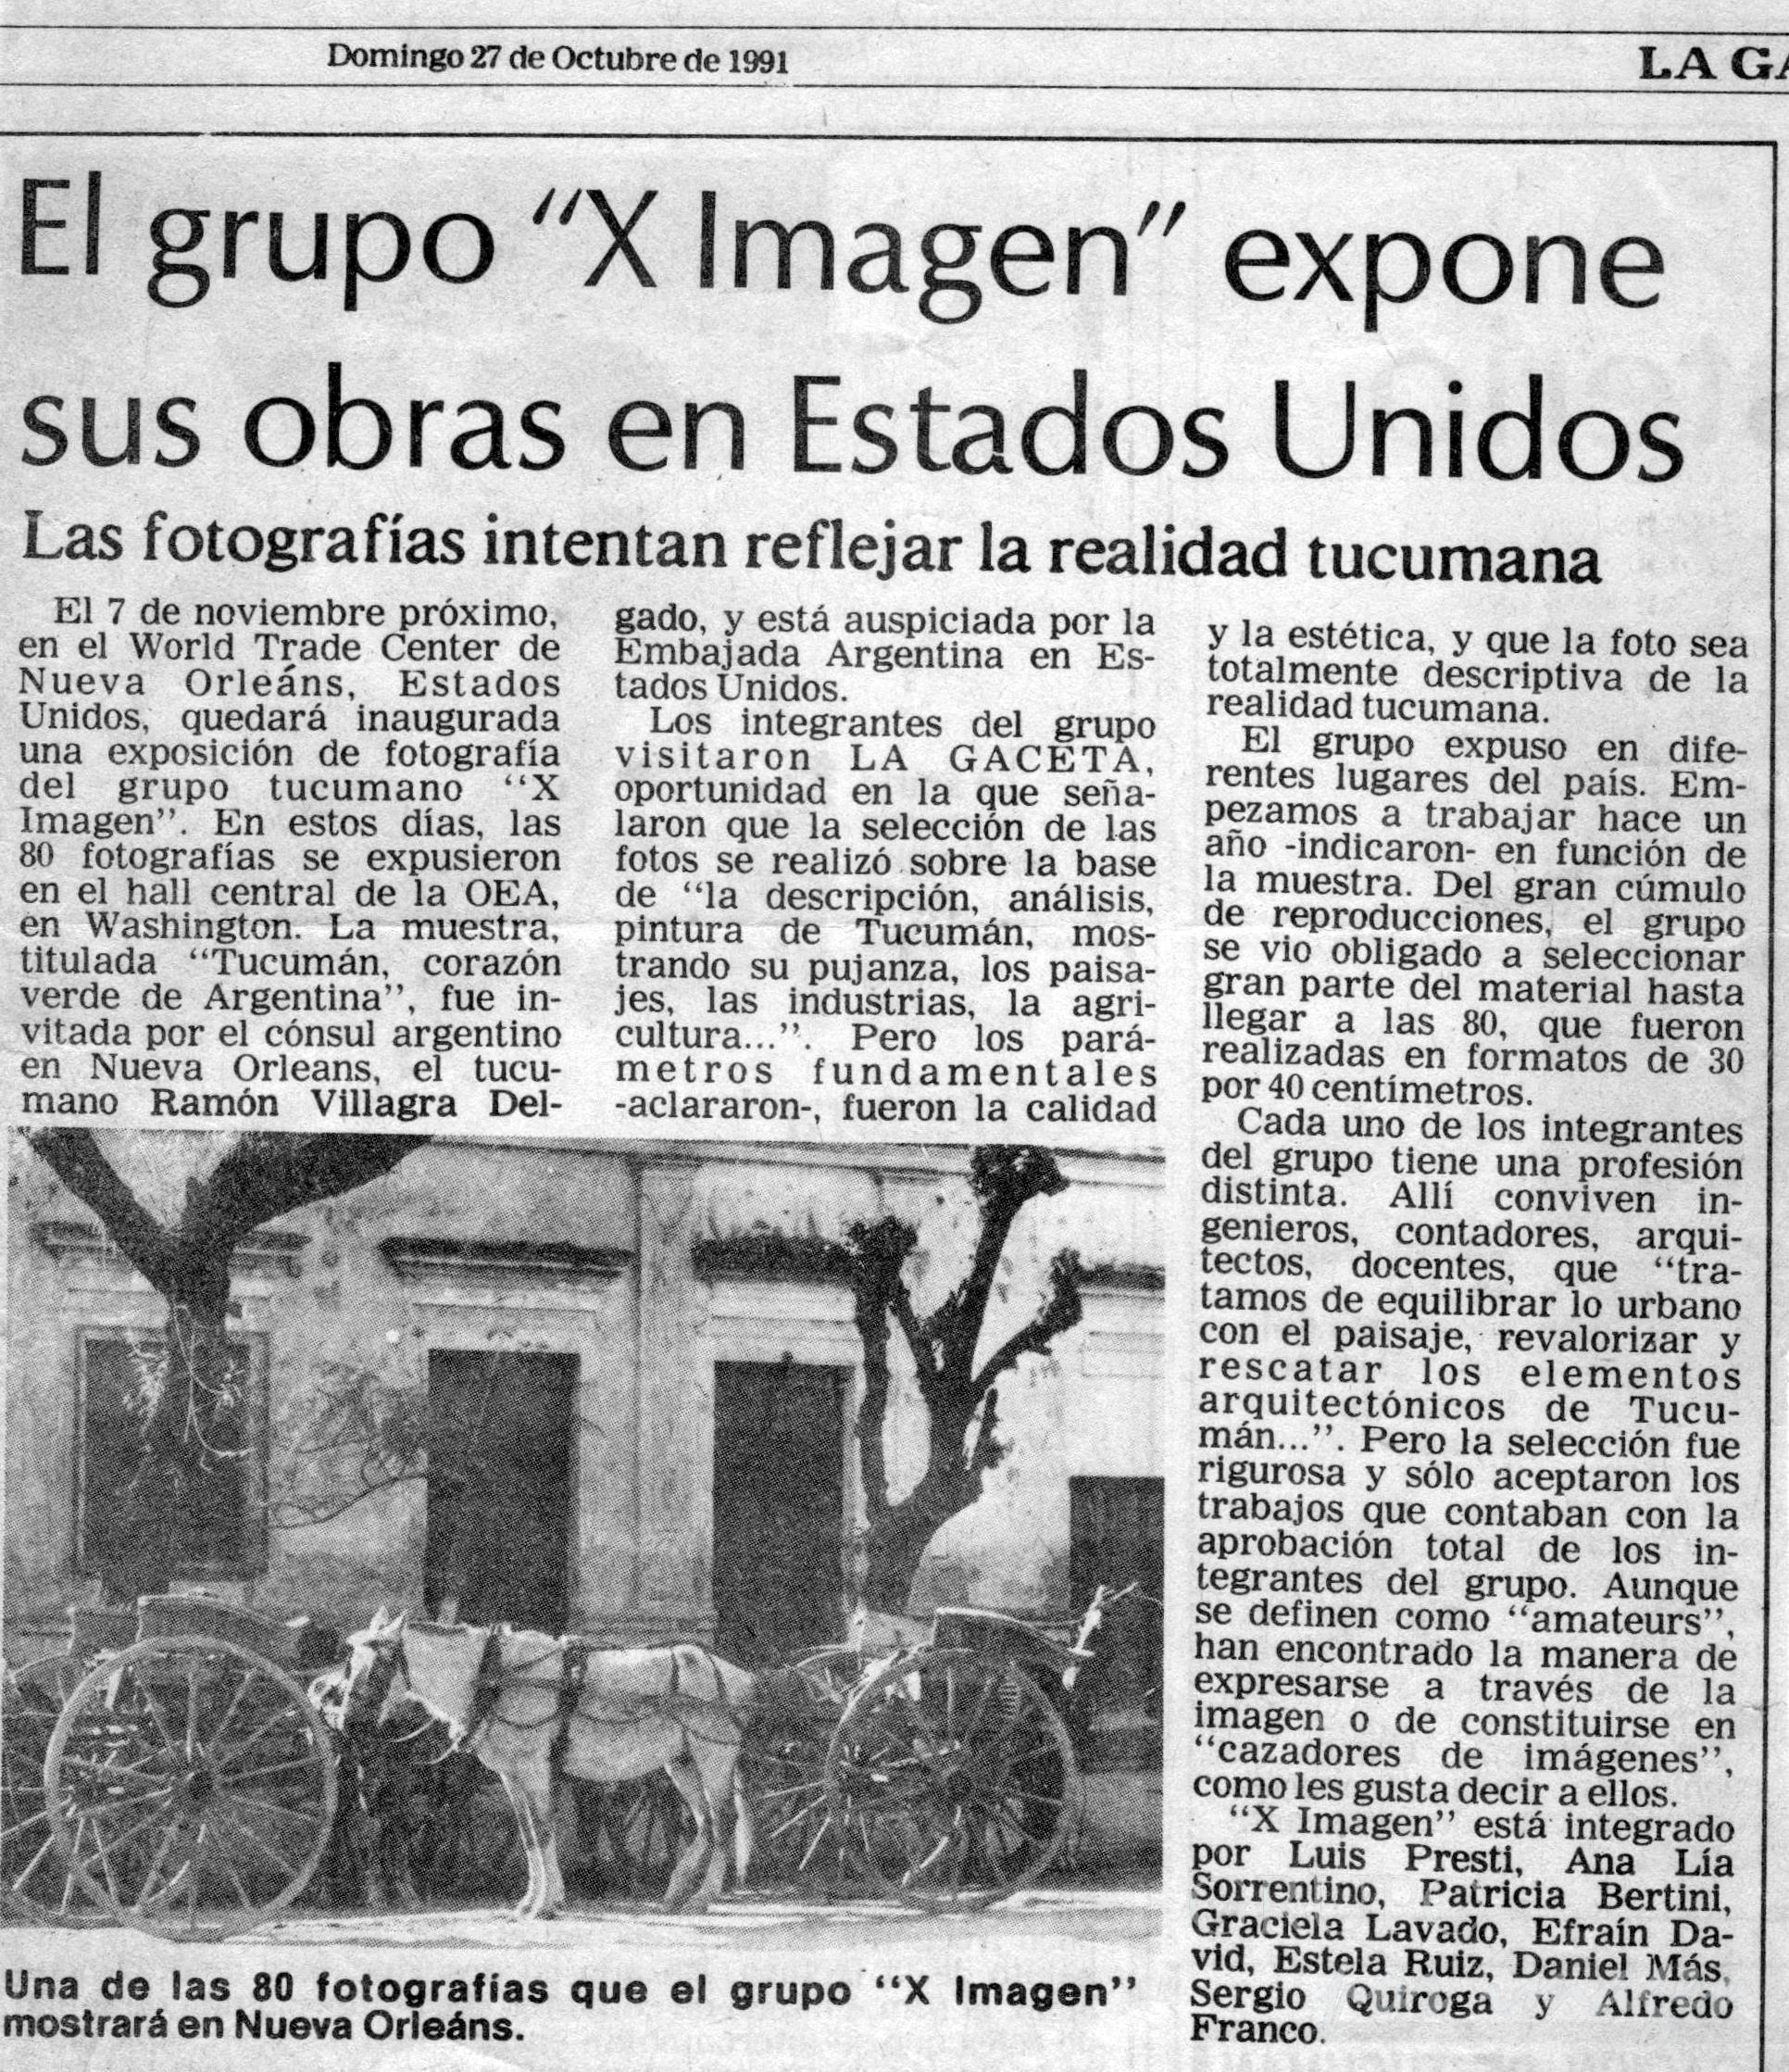 Grupo Por Imagen expone en Estados Unidos